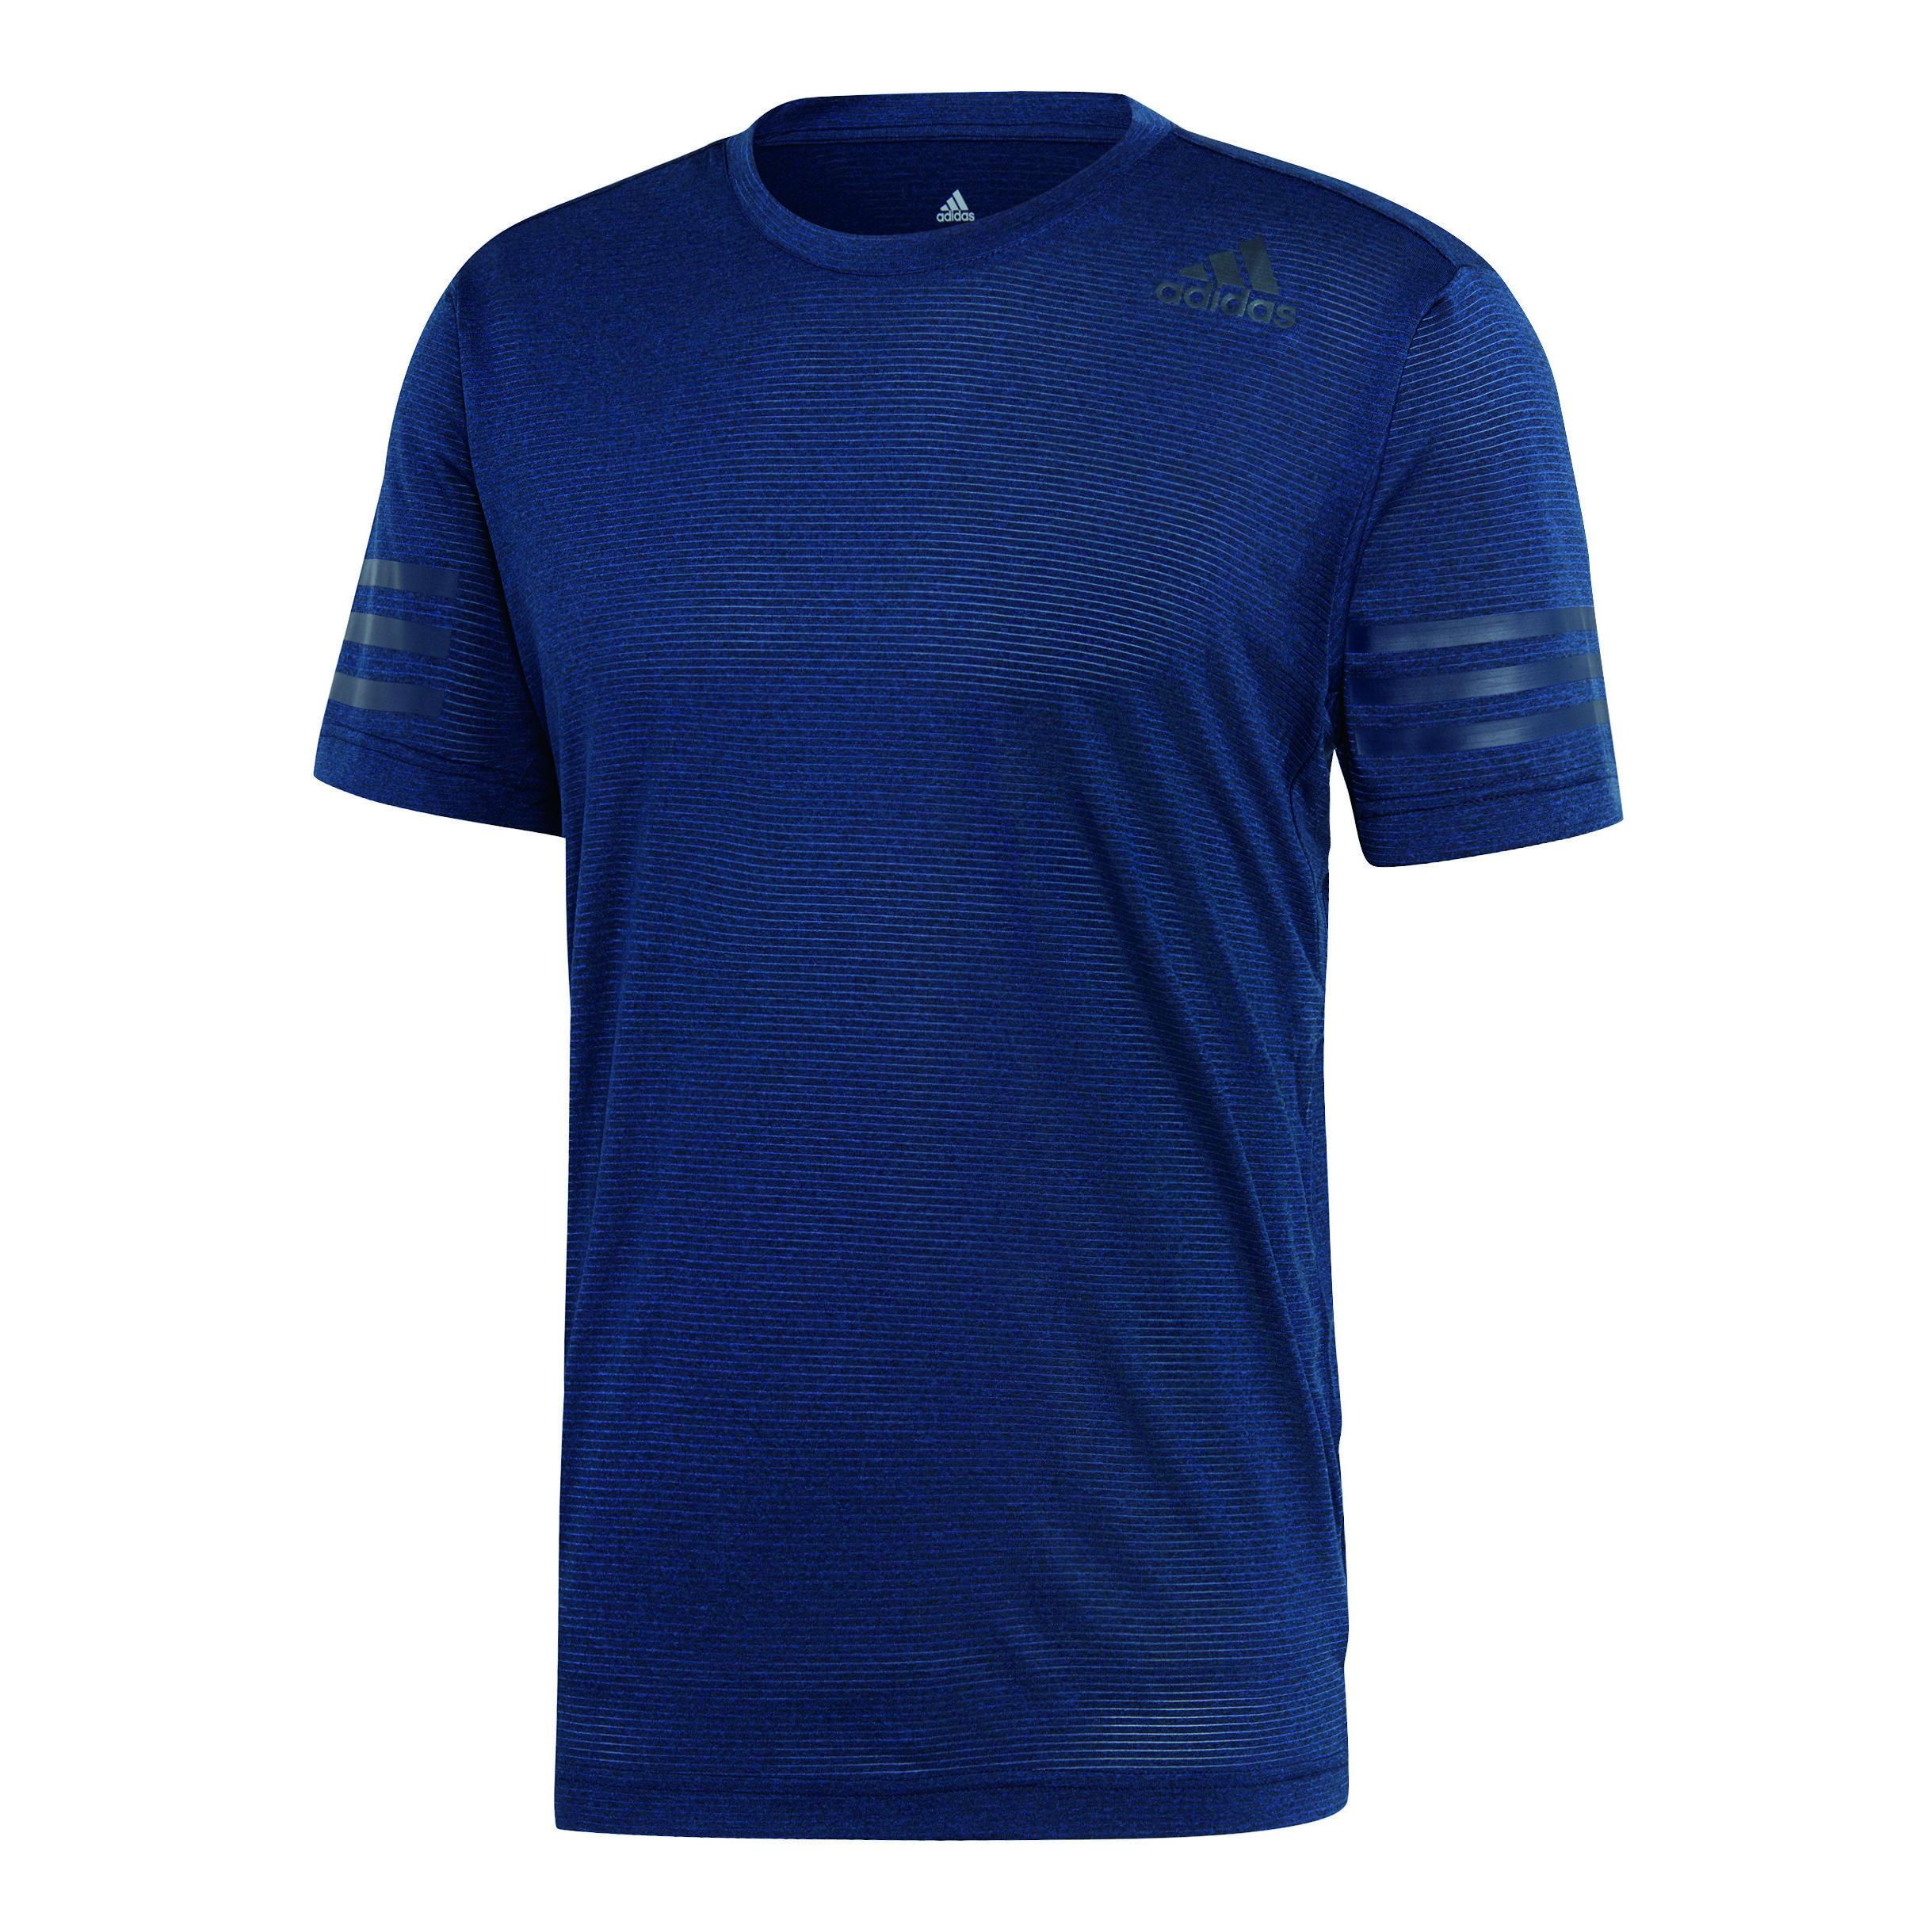 adidas FreeLift Climacool T shirt Heren Donkerblauw, Zwart